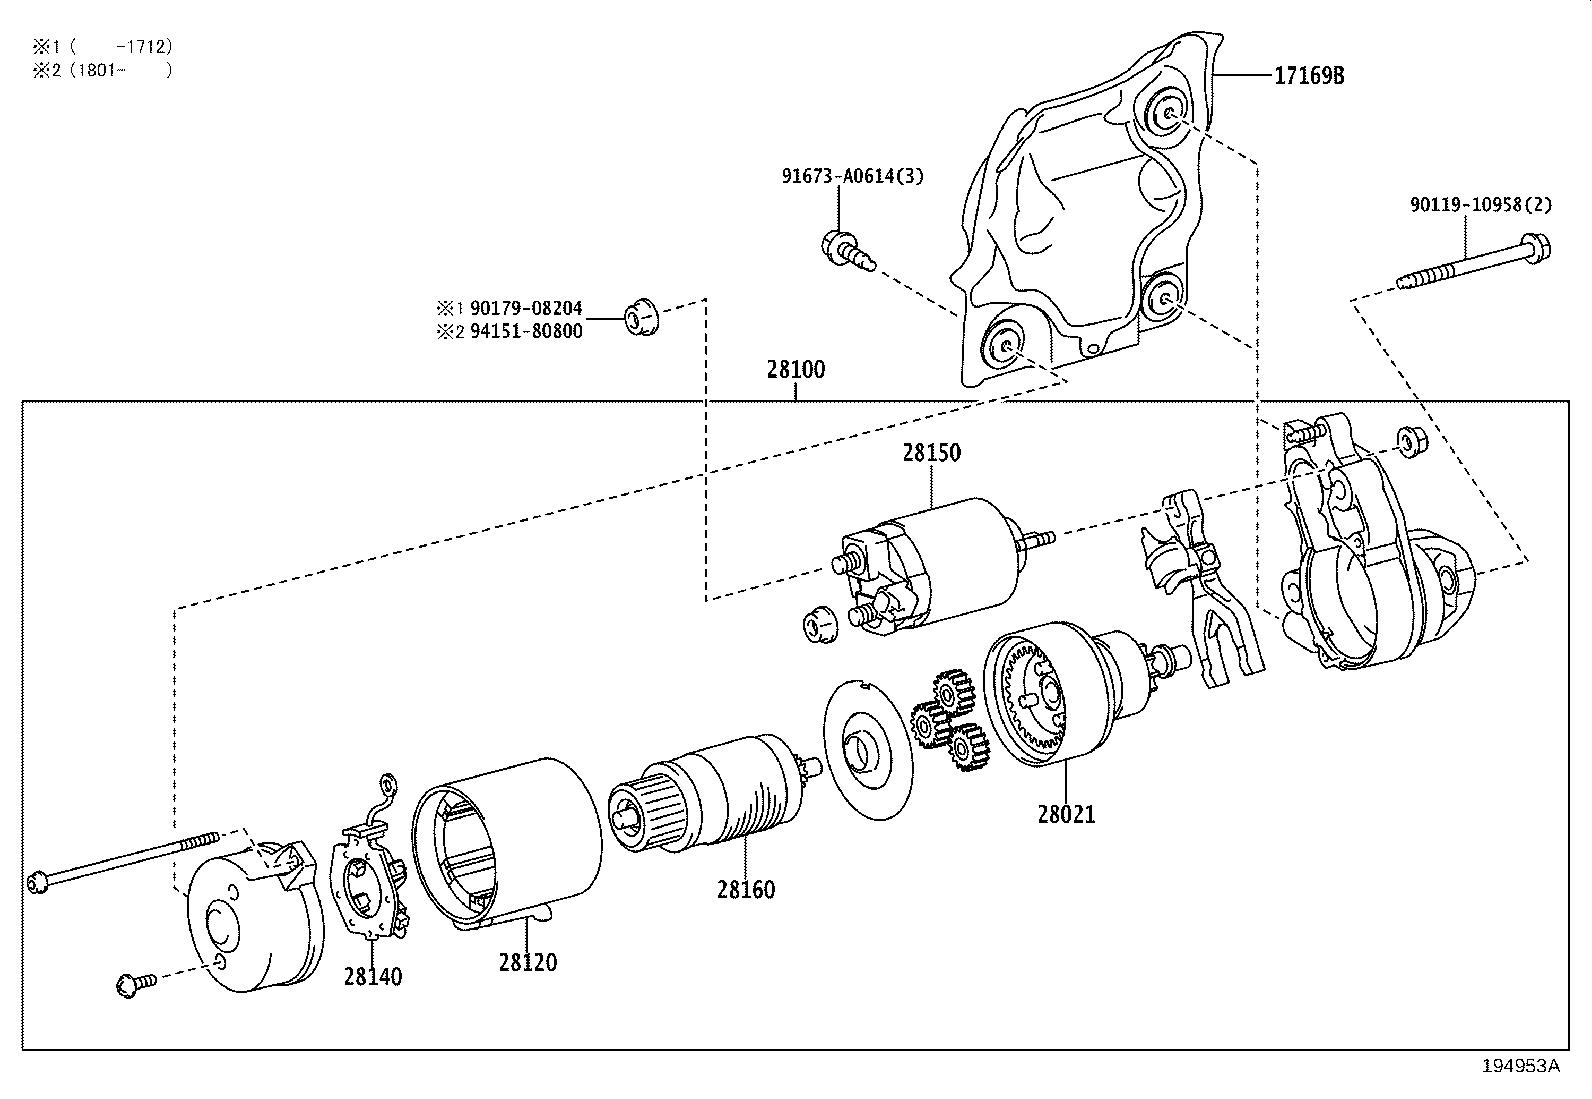 Lexus Lc 500 Armature Assembly Starter Consumption